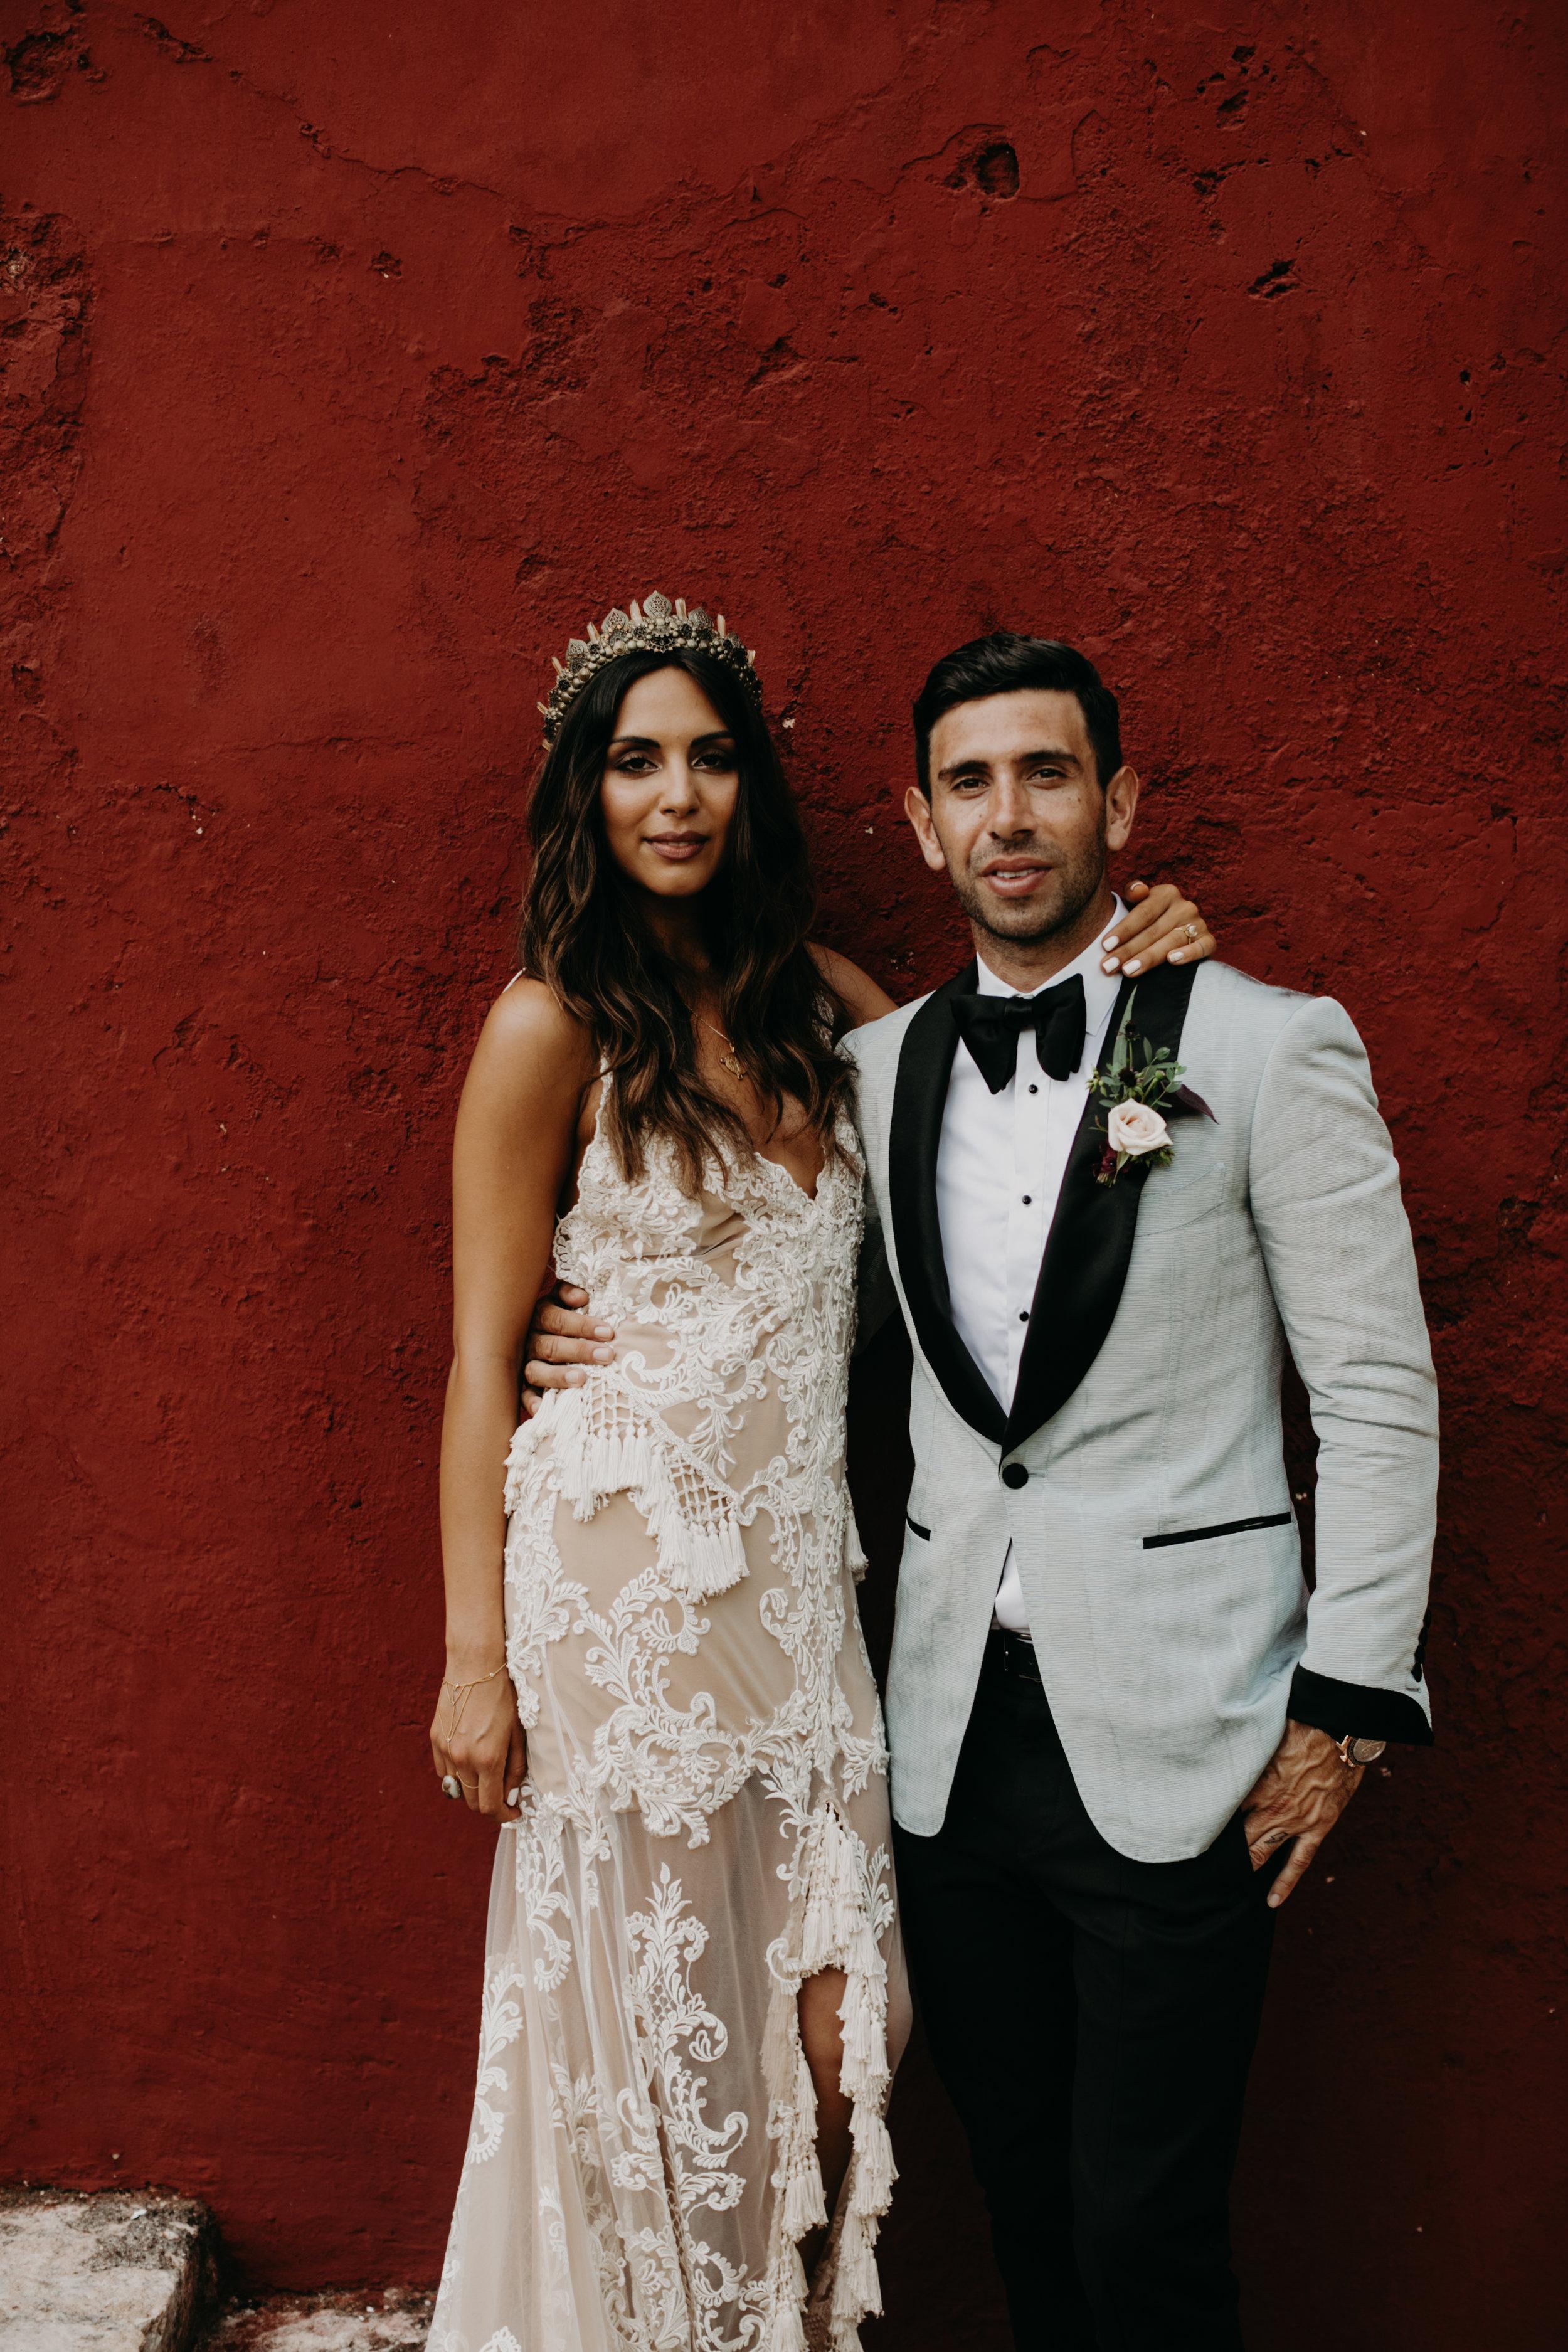 Hacienda Temozon Yucatan Mexico Wedding | Ida & Peter Emily Magers Photography-730.jpg